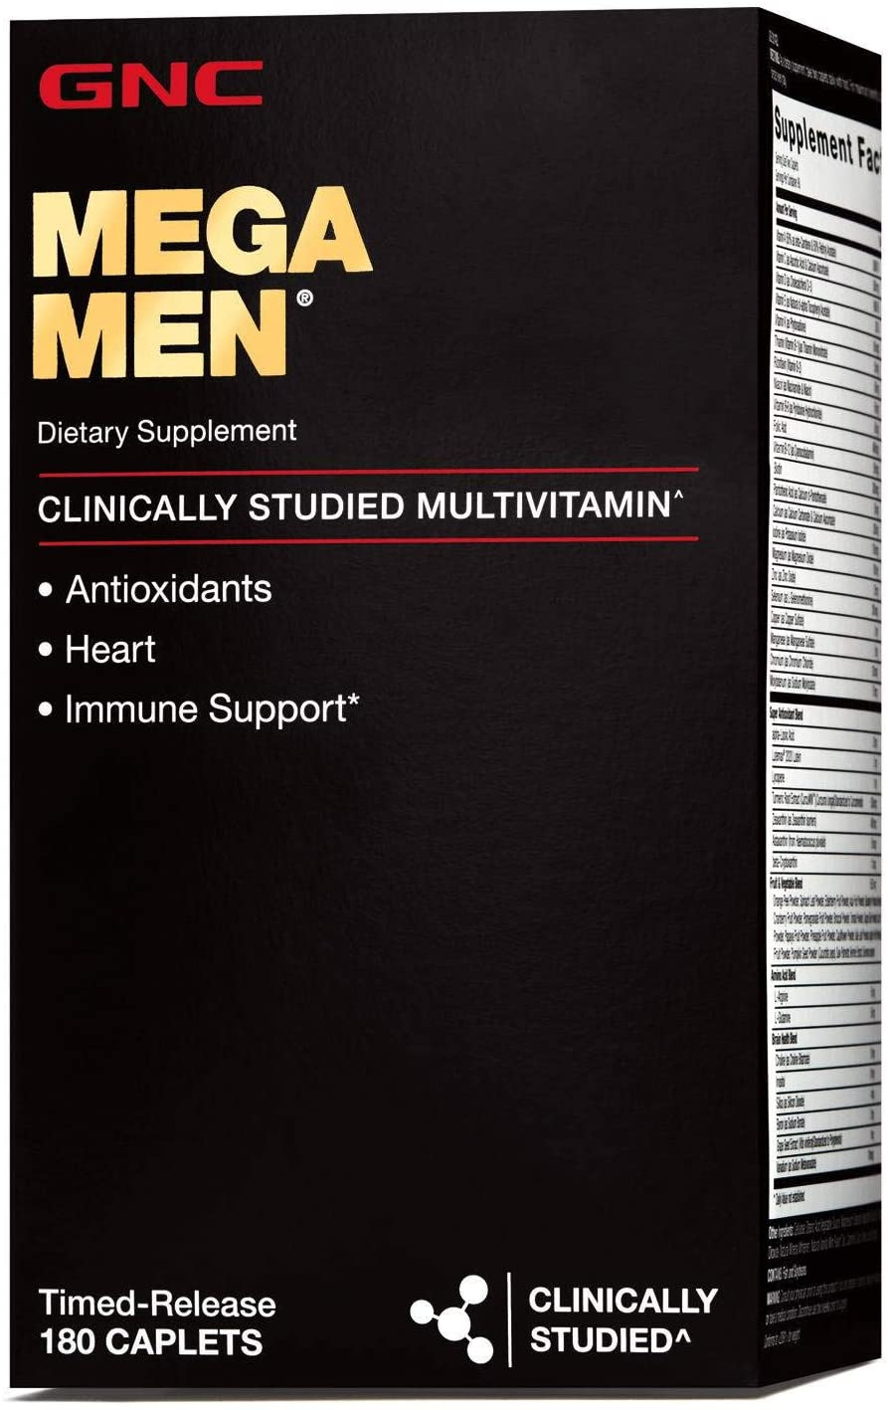 GNC Mega Men Multivitamin Max 77% OFF for Count 180 Limited time cheap sale Hear Antioxidants